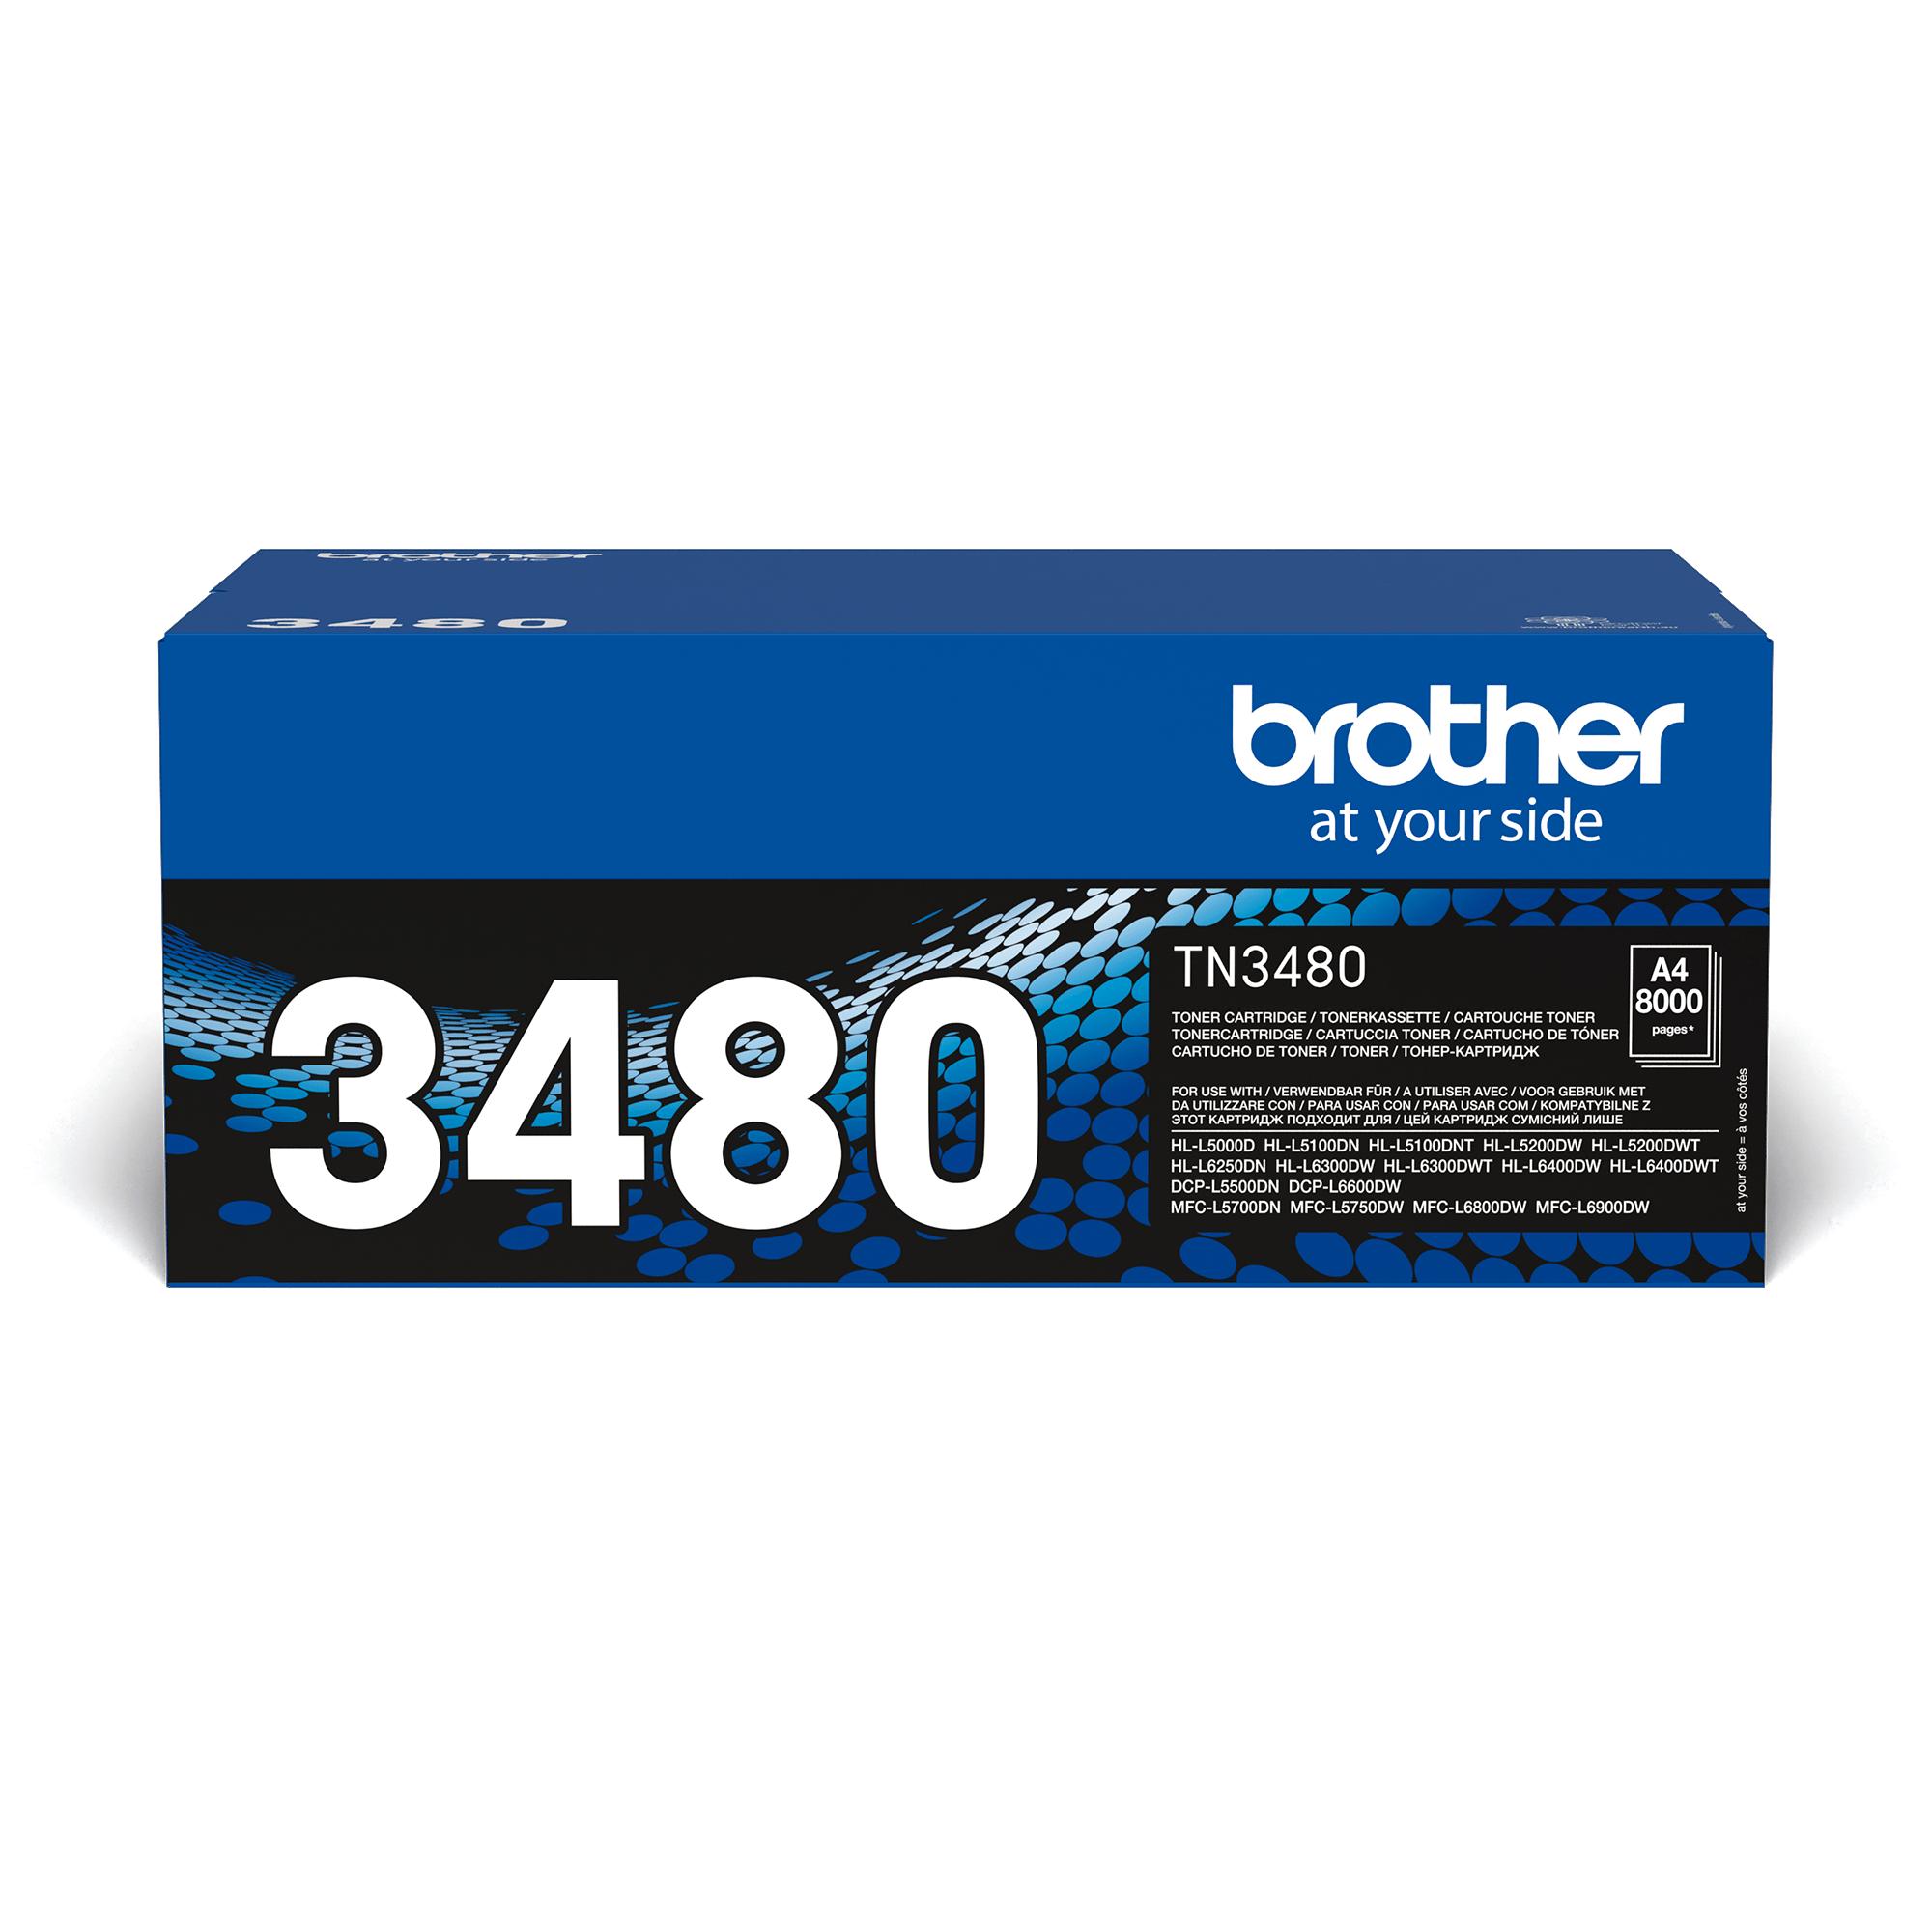 TN-3480 toner noir d'origine Brother à haut rendement 2